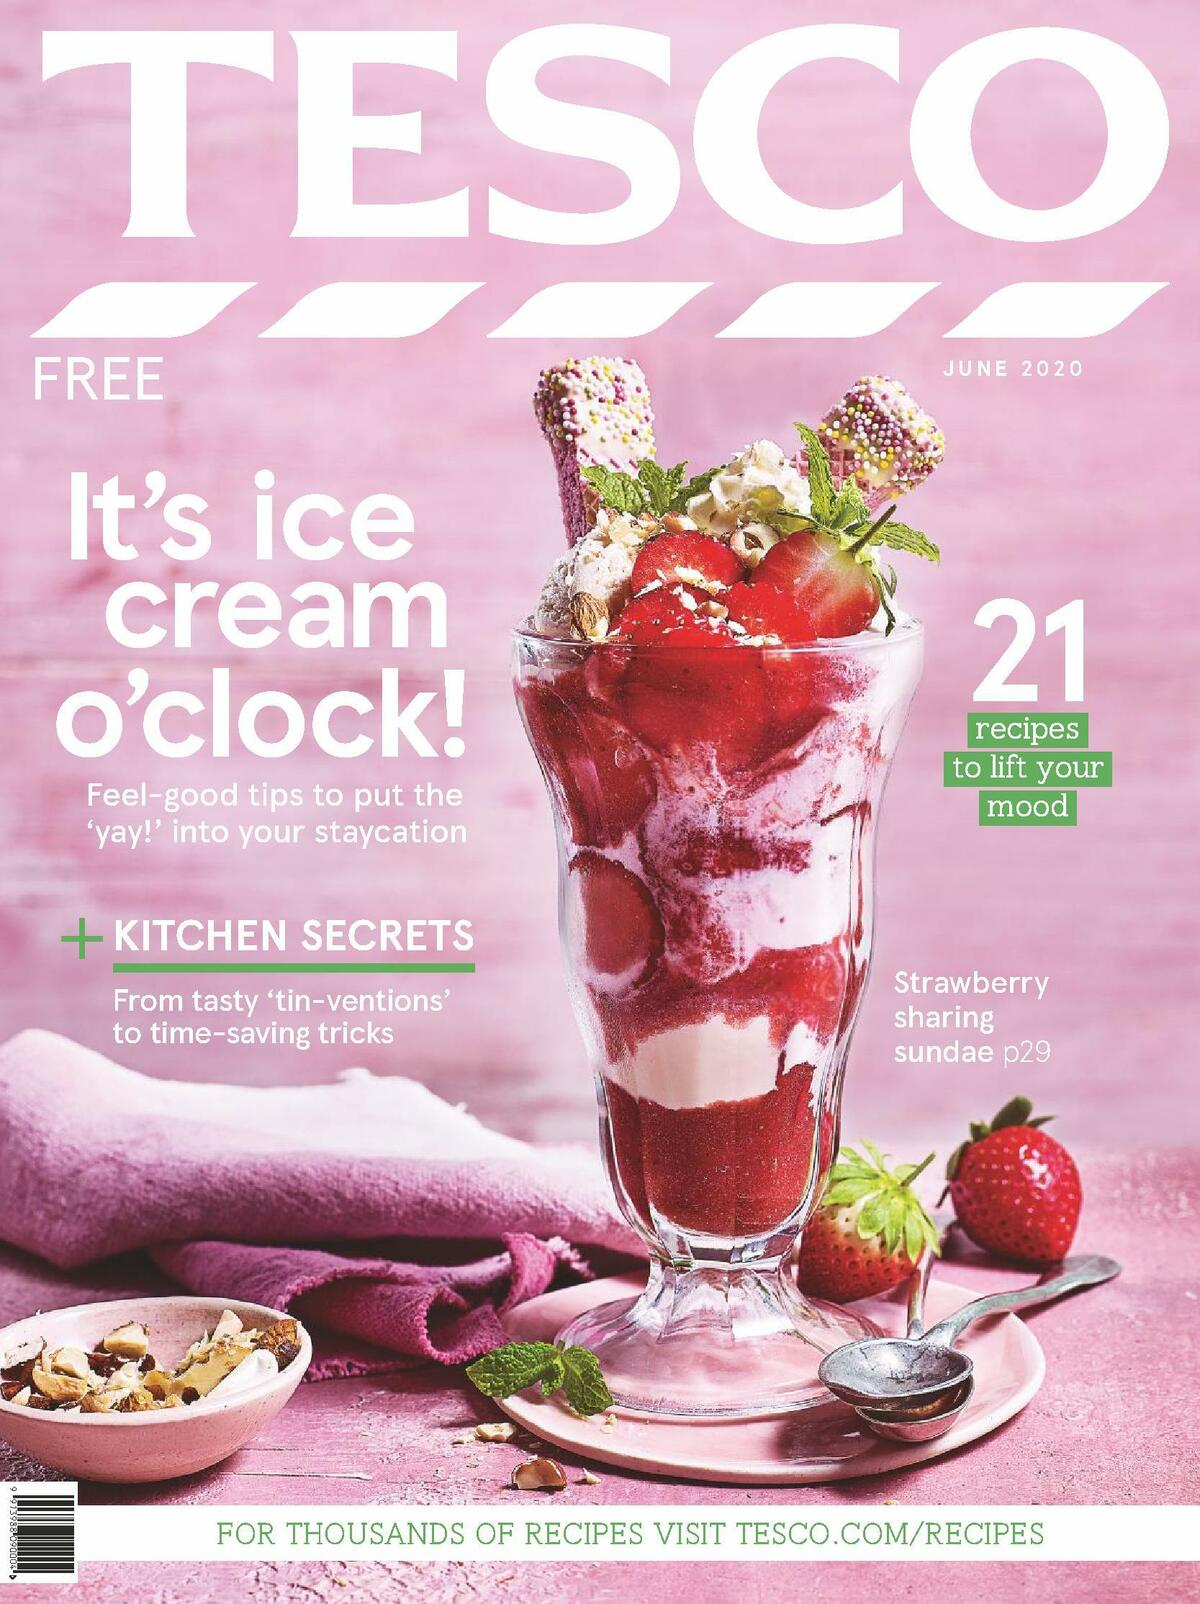 TESCO Magazine June Offers from June 10